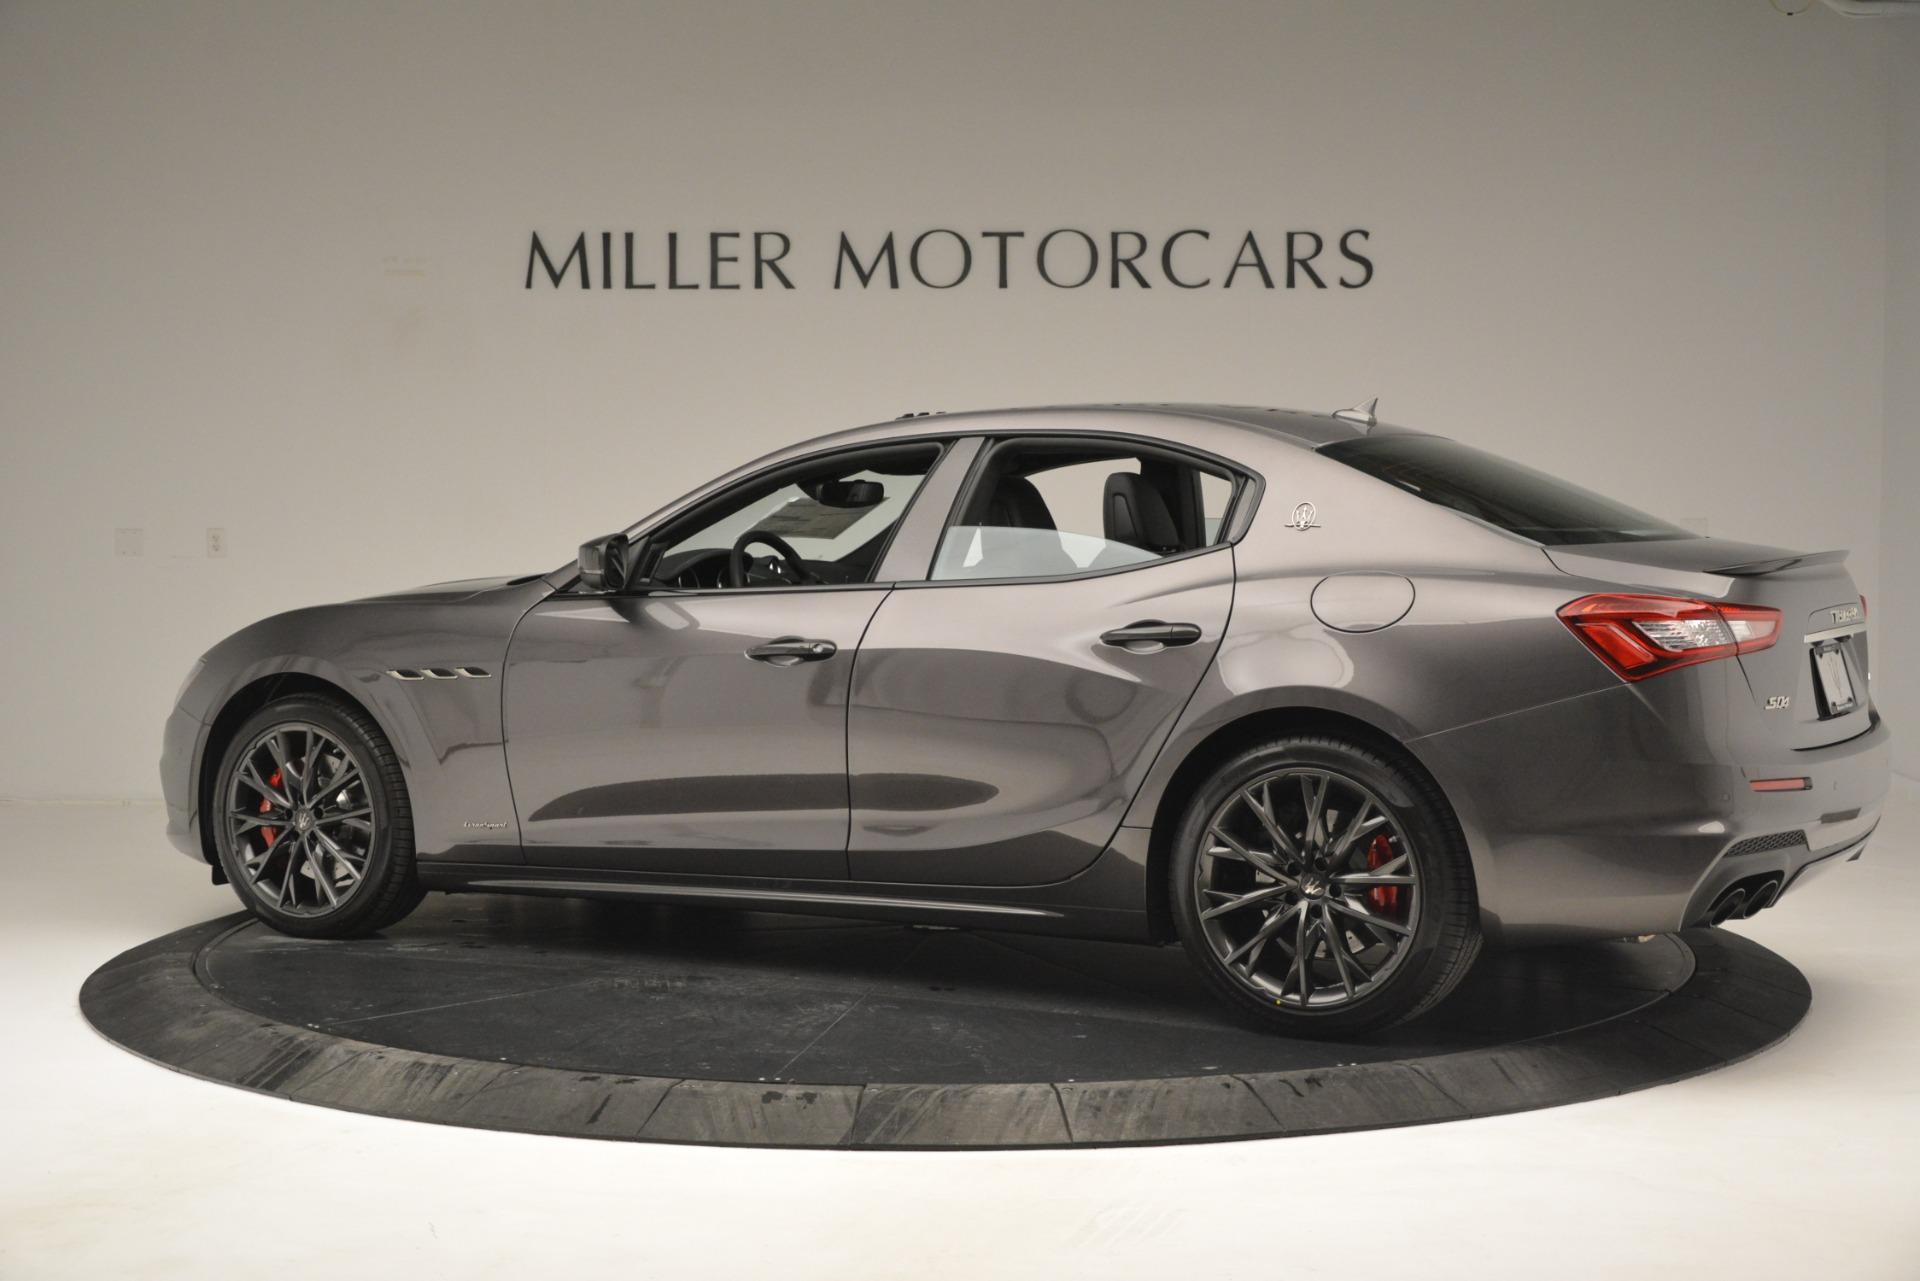 New 2019 Maserati Ghibli S Q4 GranSport For Sale In Greenwich, CT 2925_p5